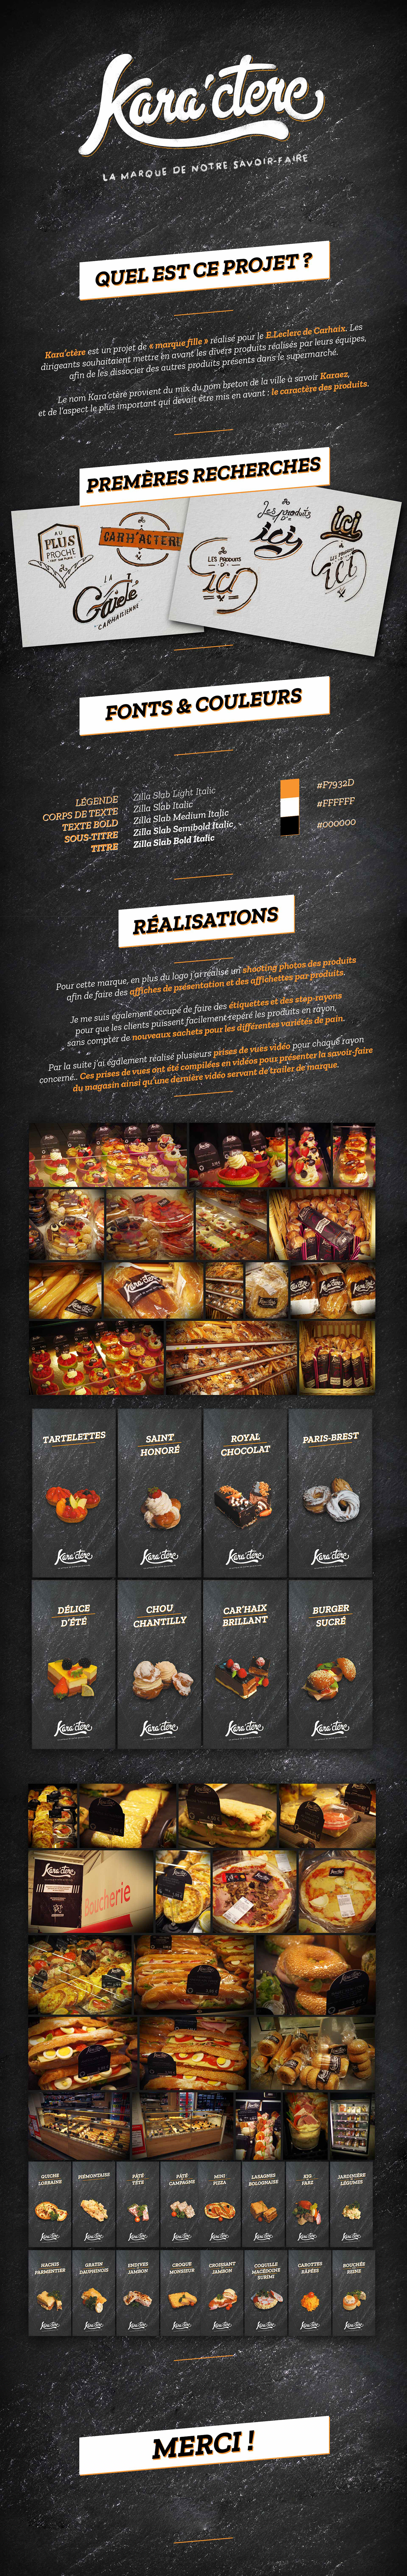 E.leclerc,brand,content,design,lettering,kara'ctère,valentin,poinot,cooking